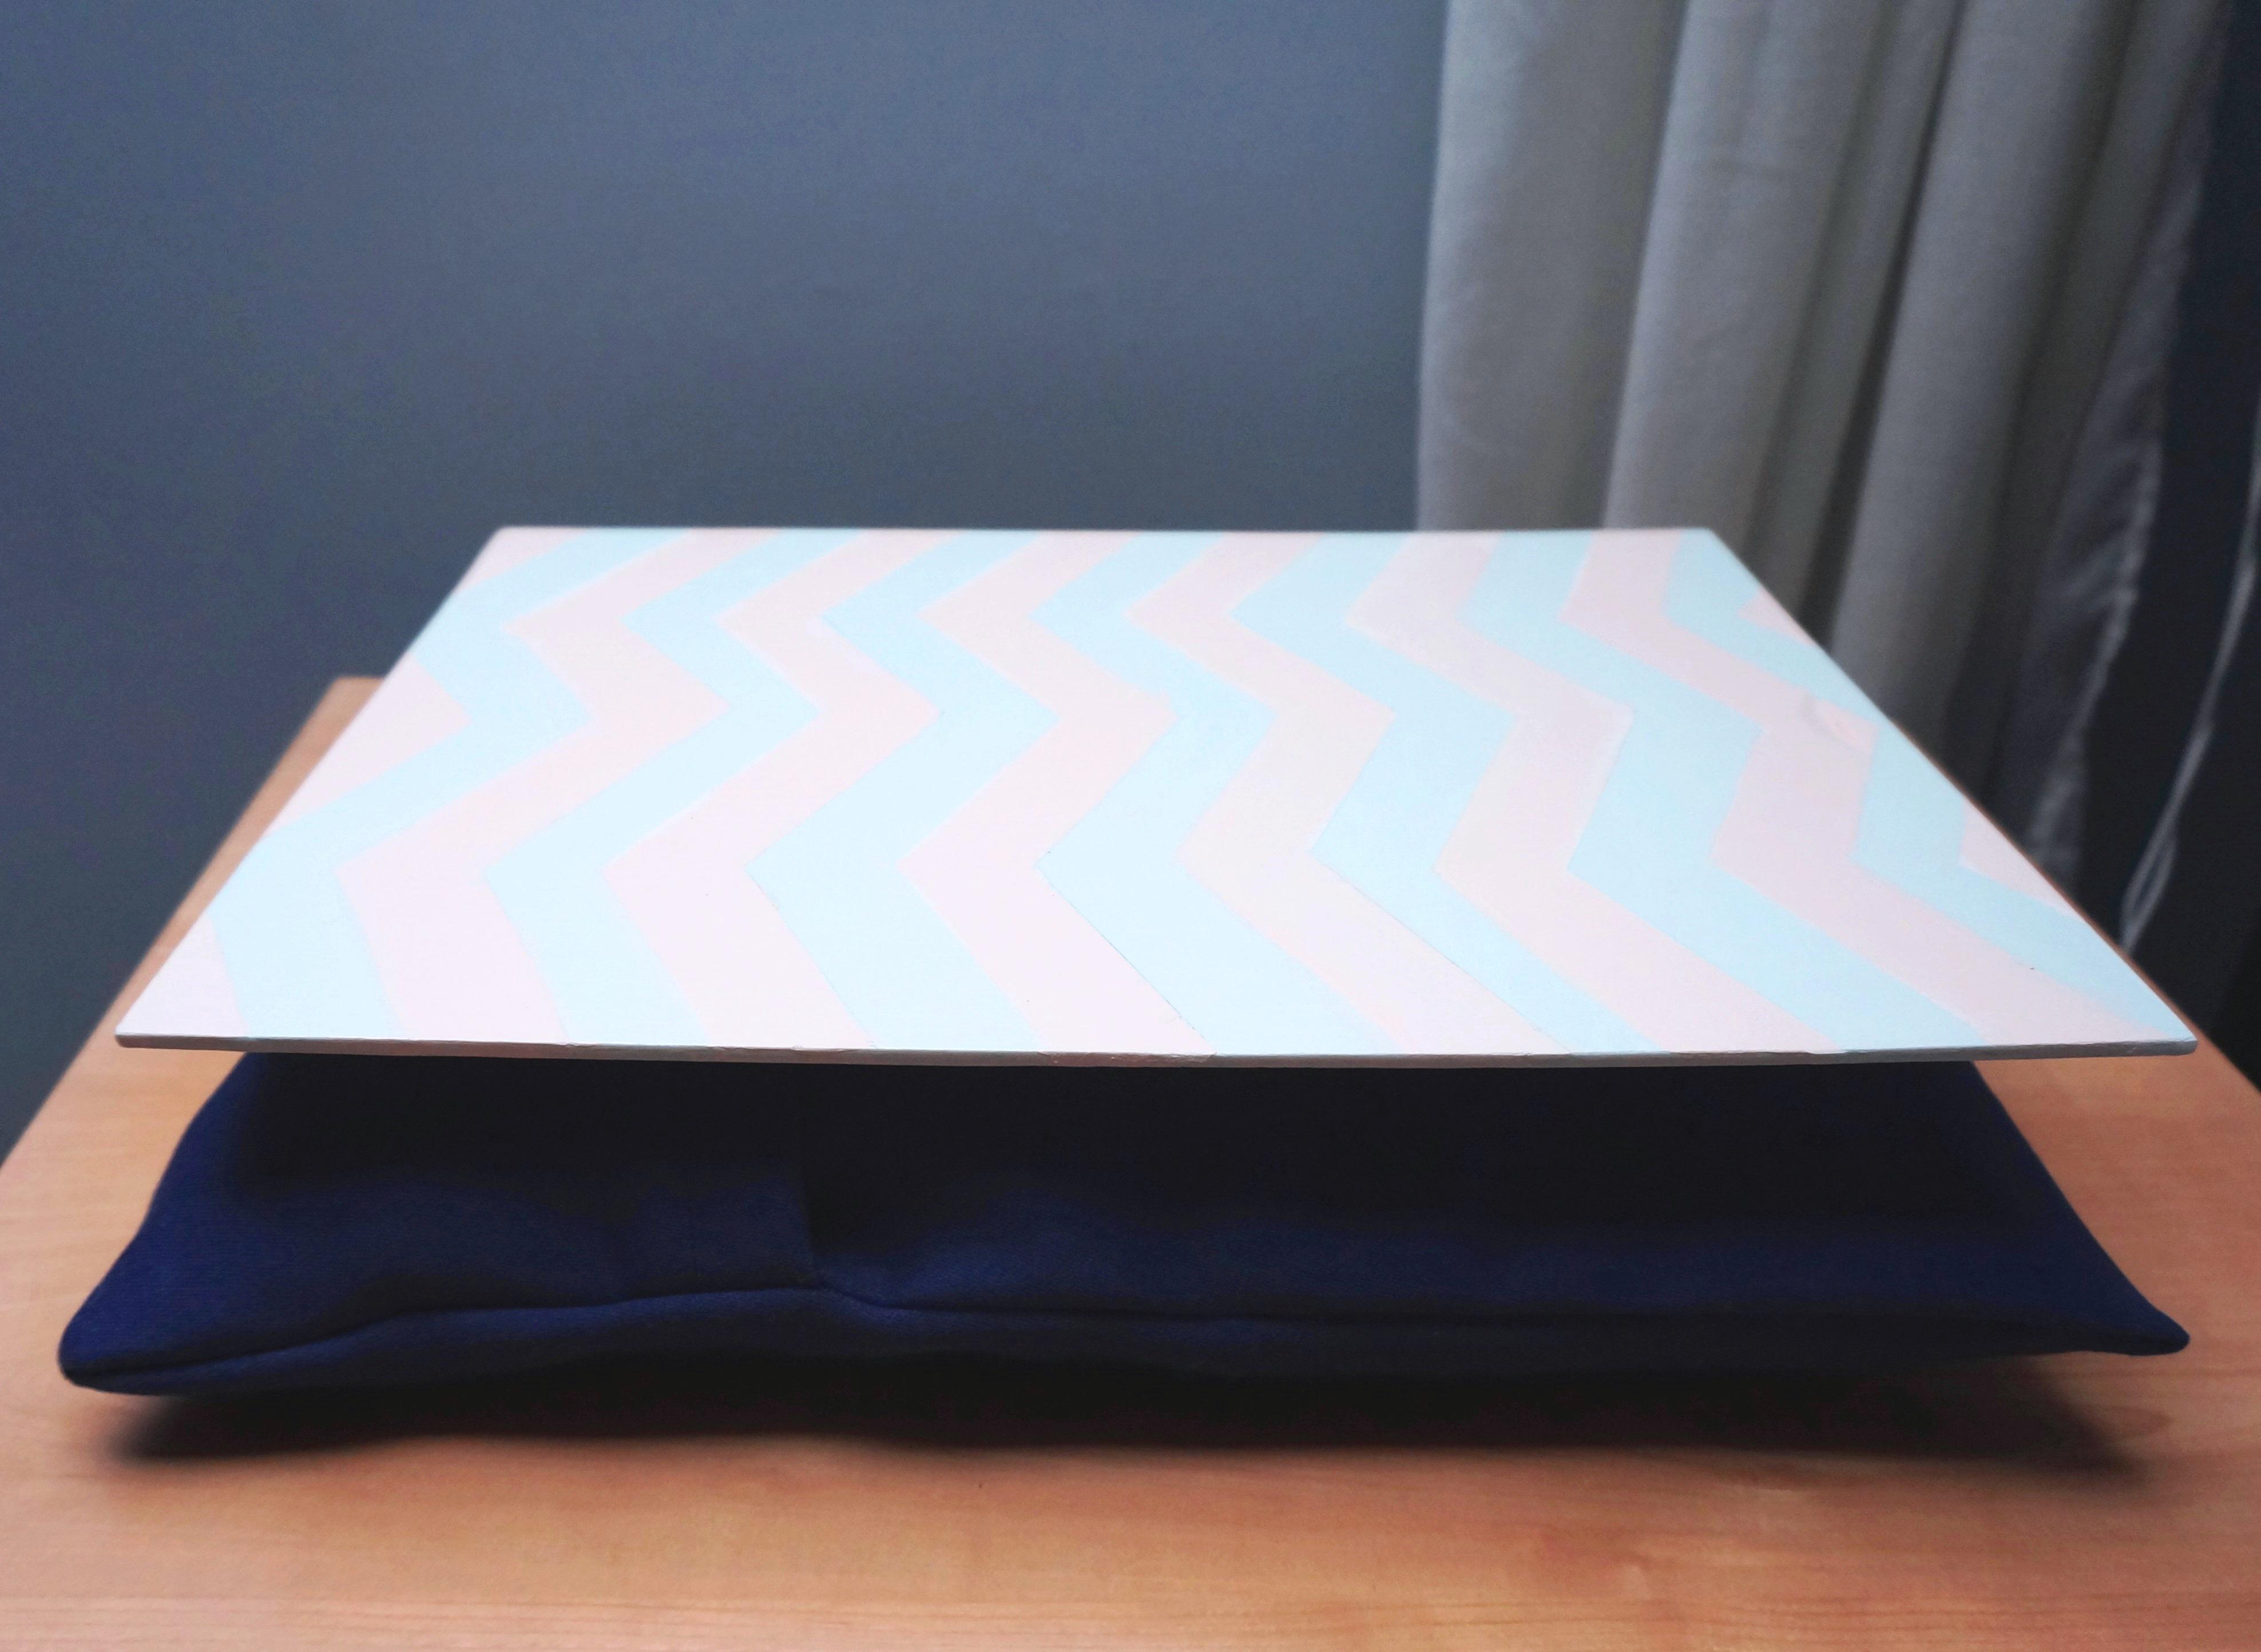 staples of reviravoltta best walmart desk solutions com cushioned lap